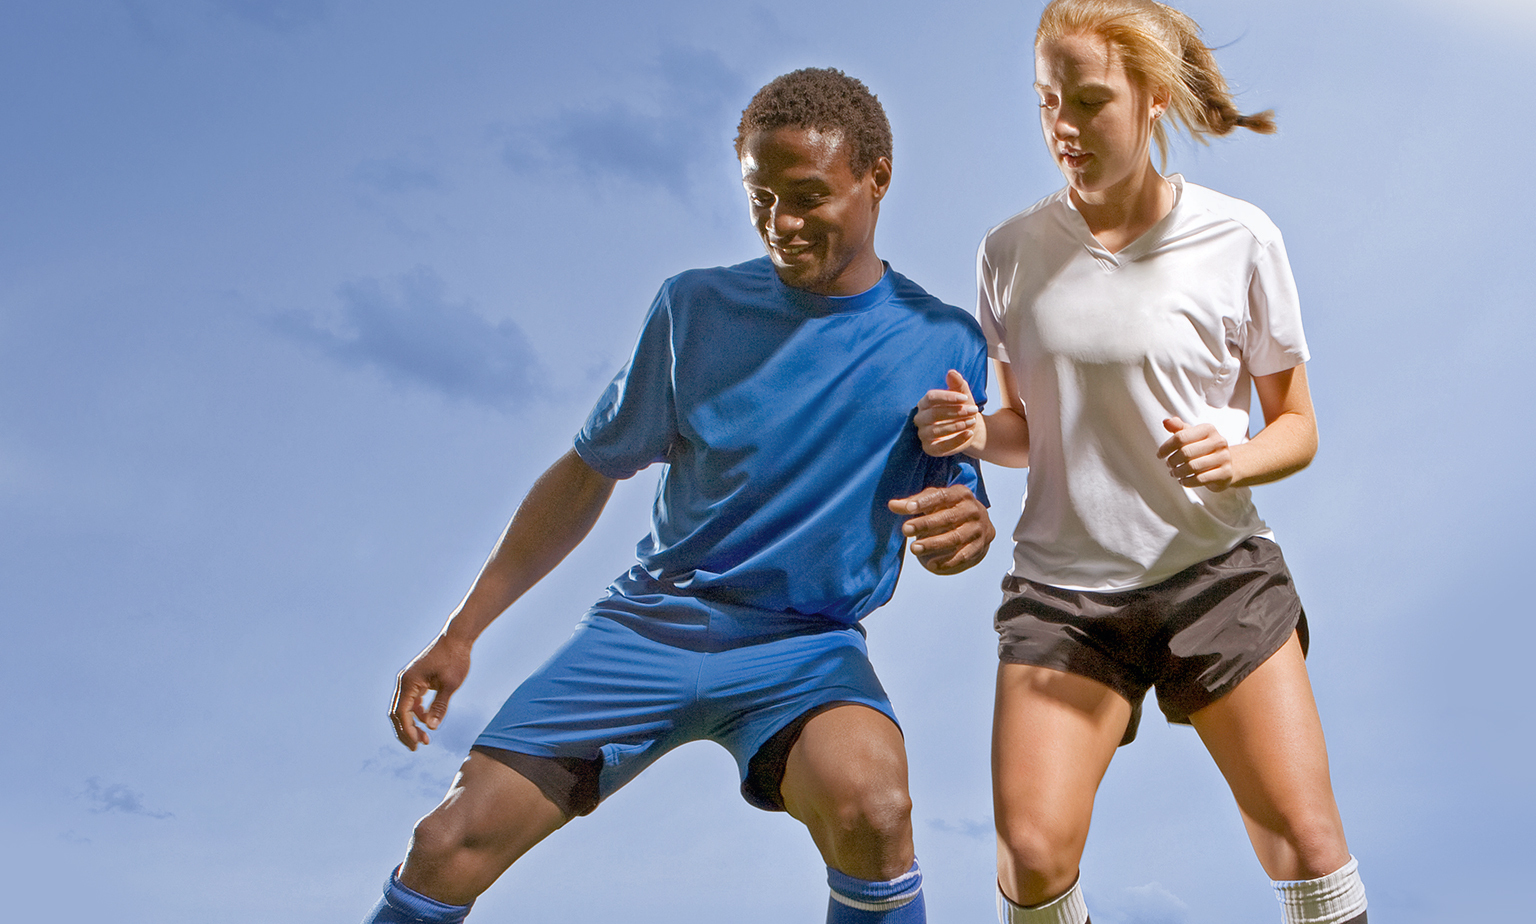 Am Ball bleiben mit aktueller Sportswear